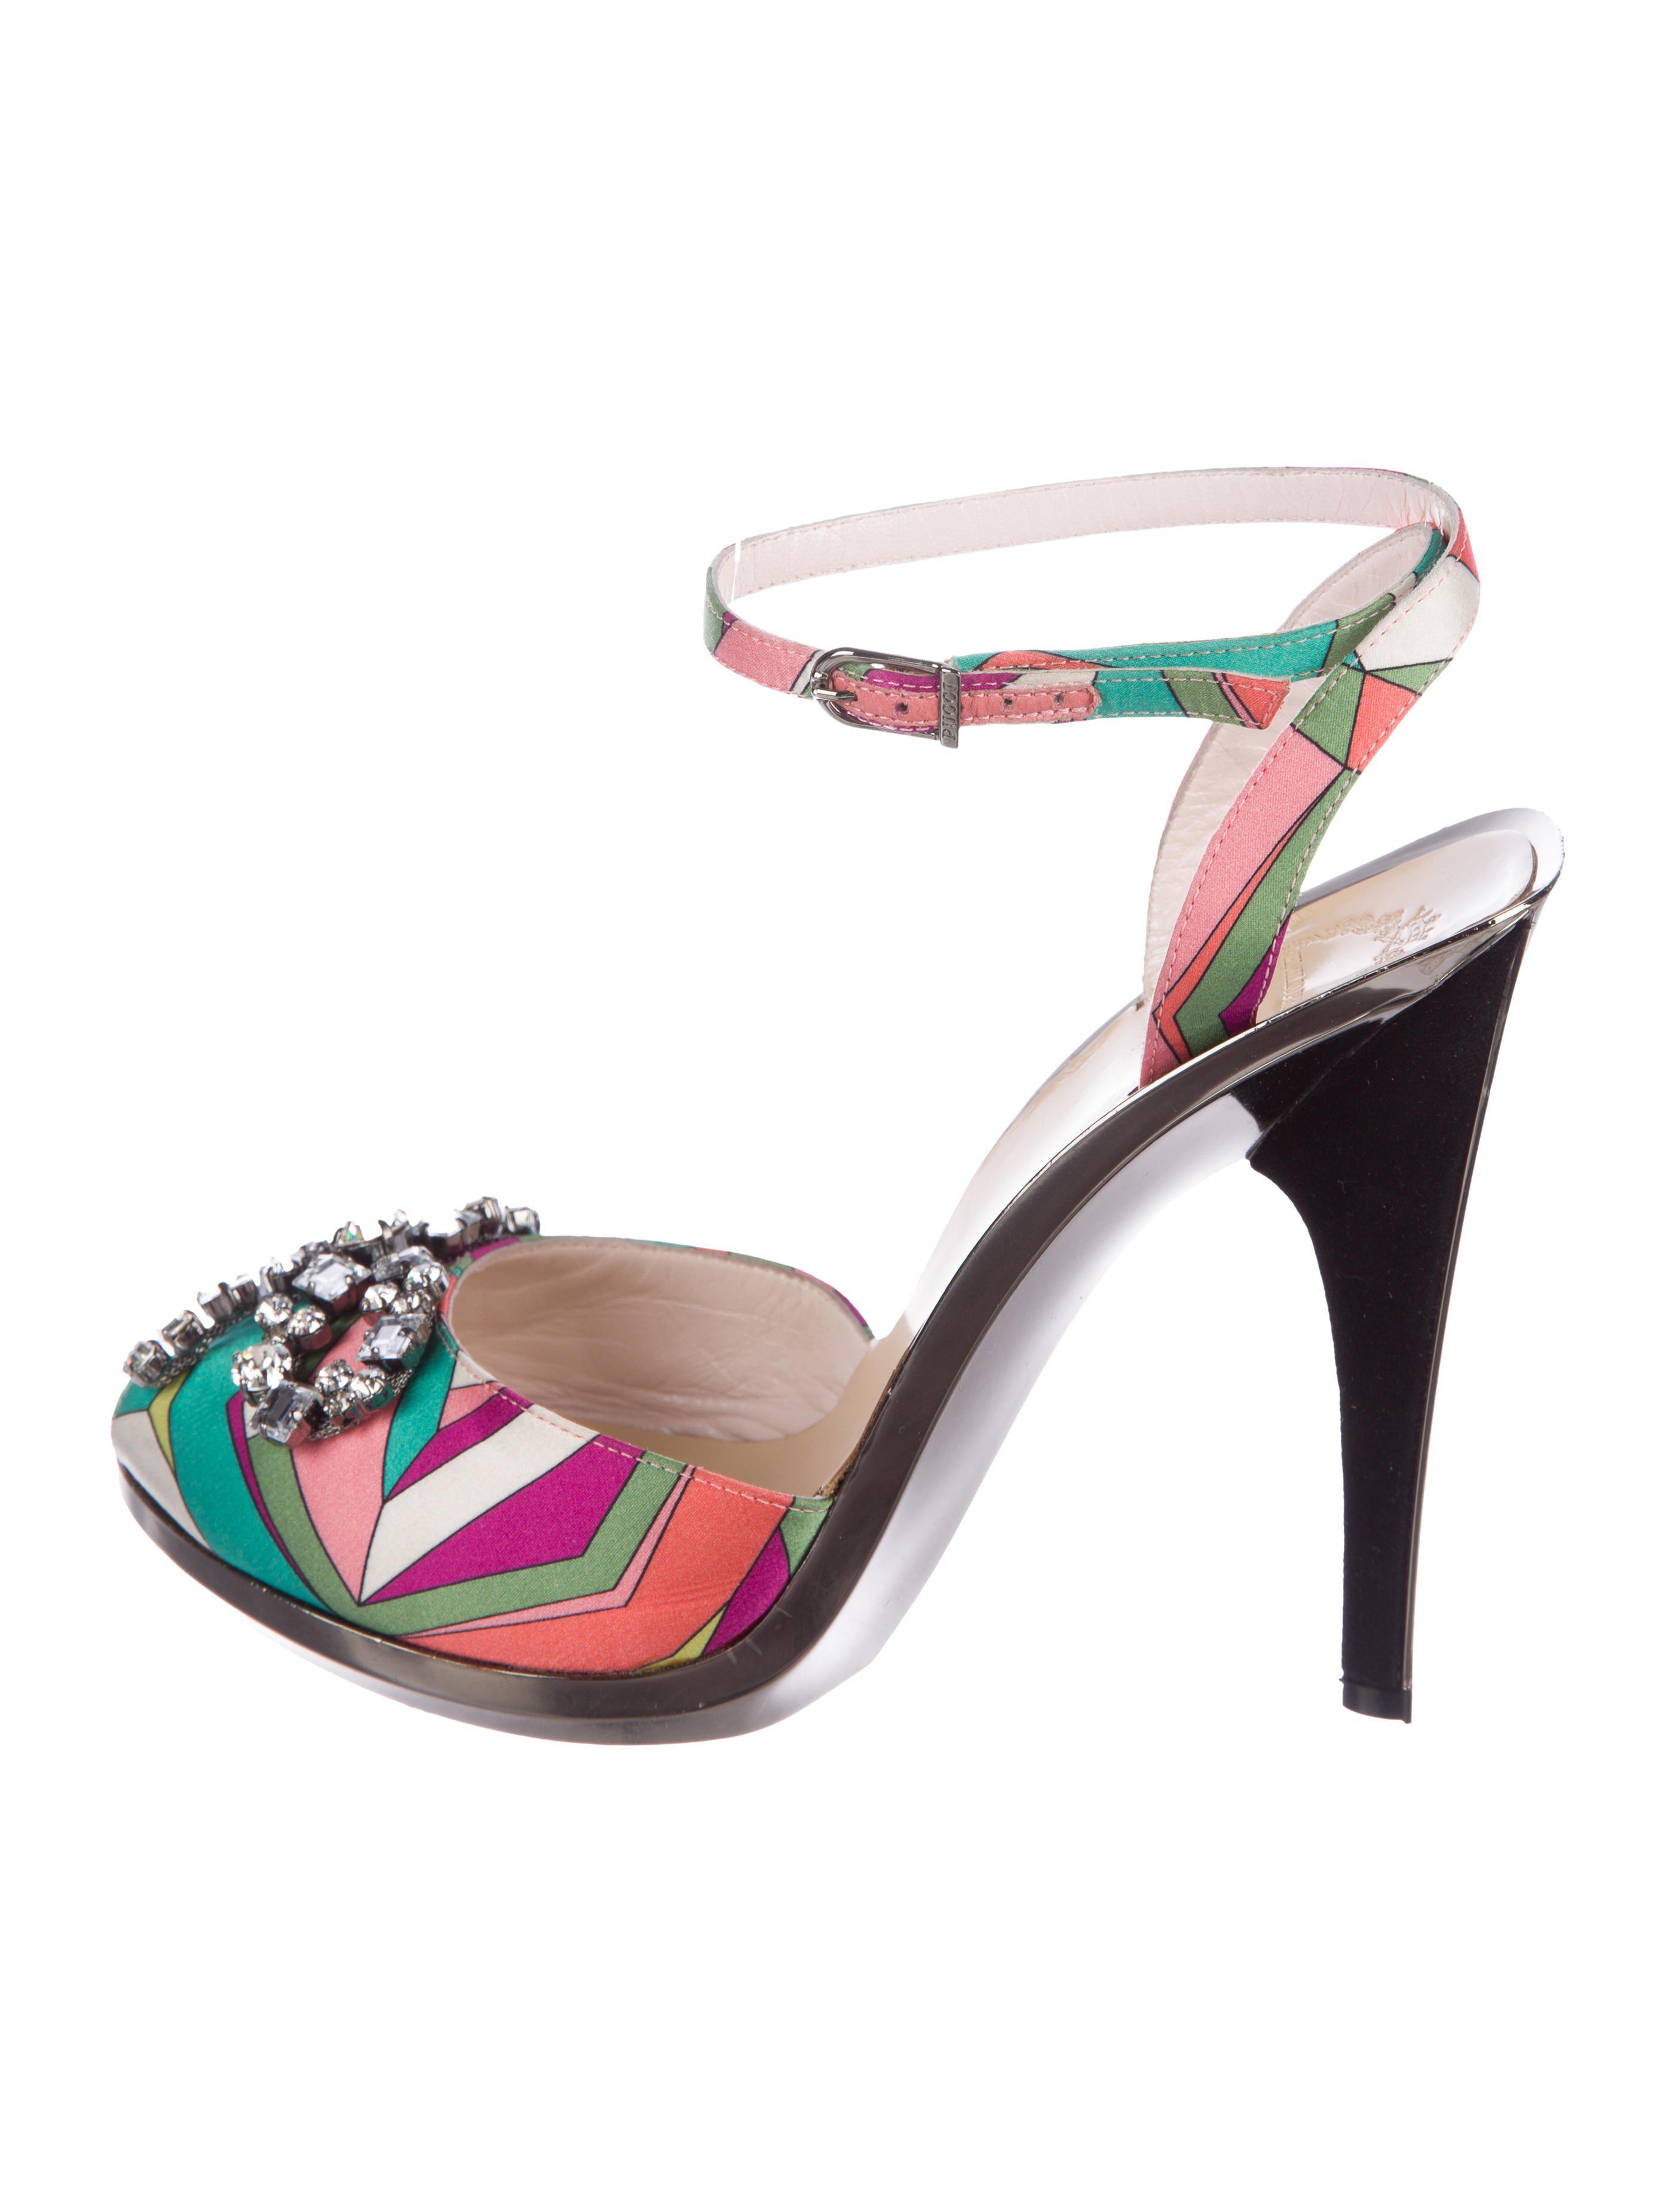 Emilio Pucci Embellished Slingback Pumps deals sale online cwpYf1ID91